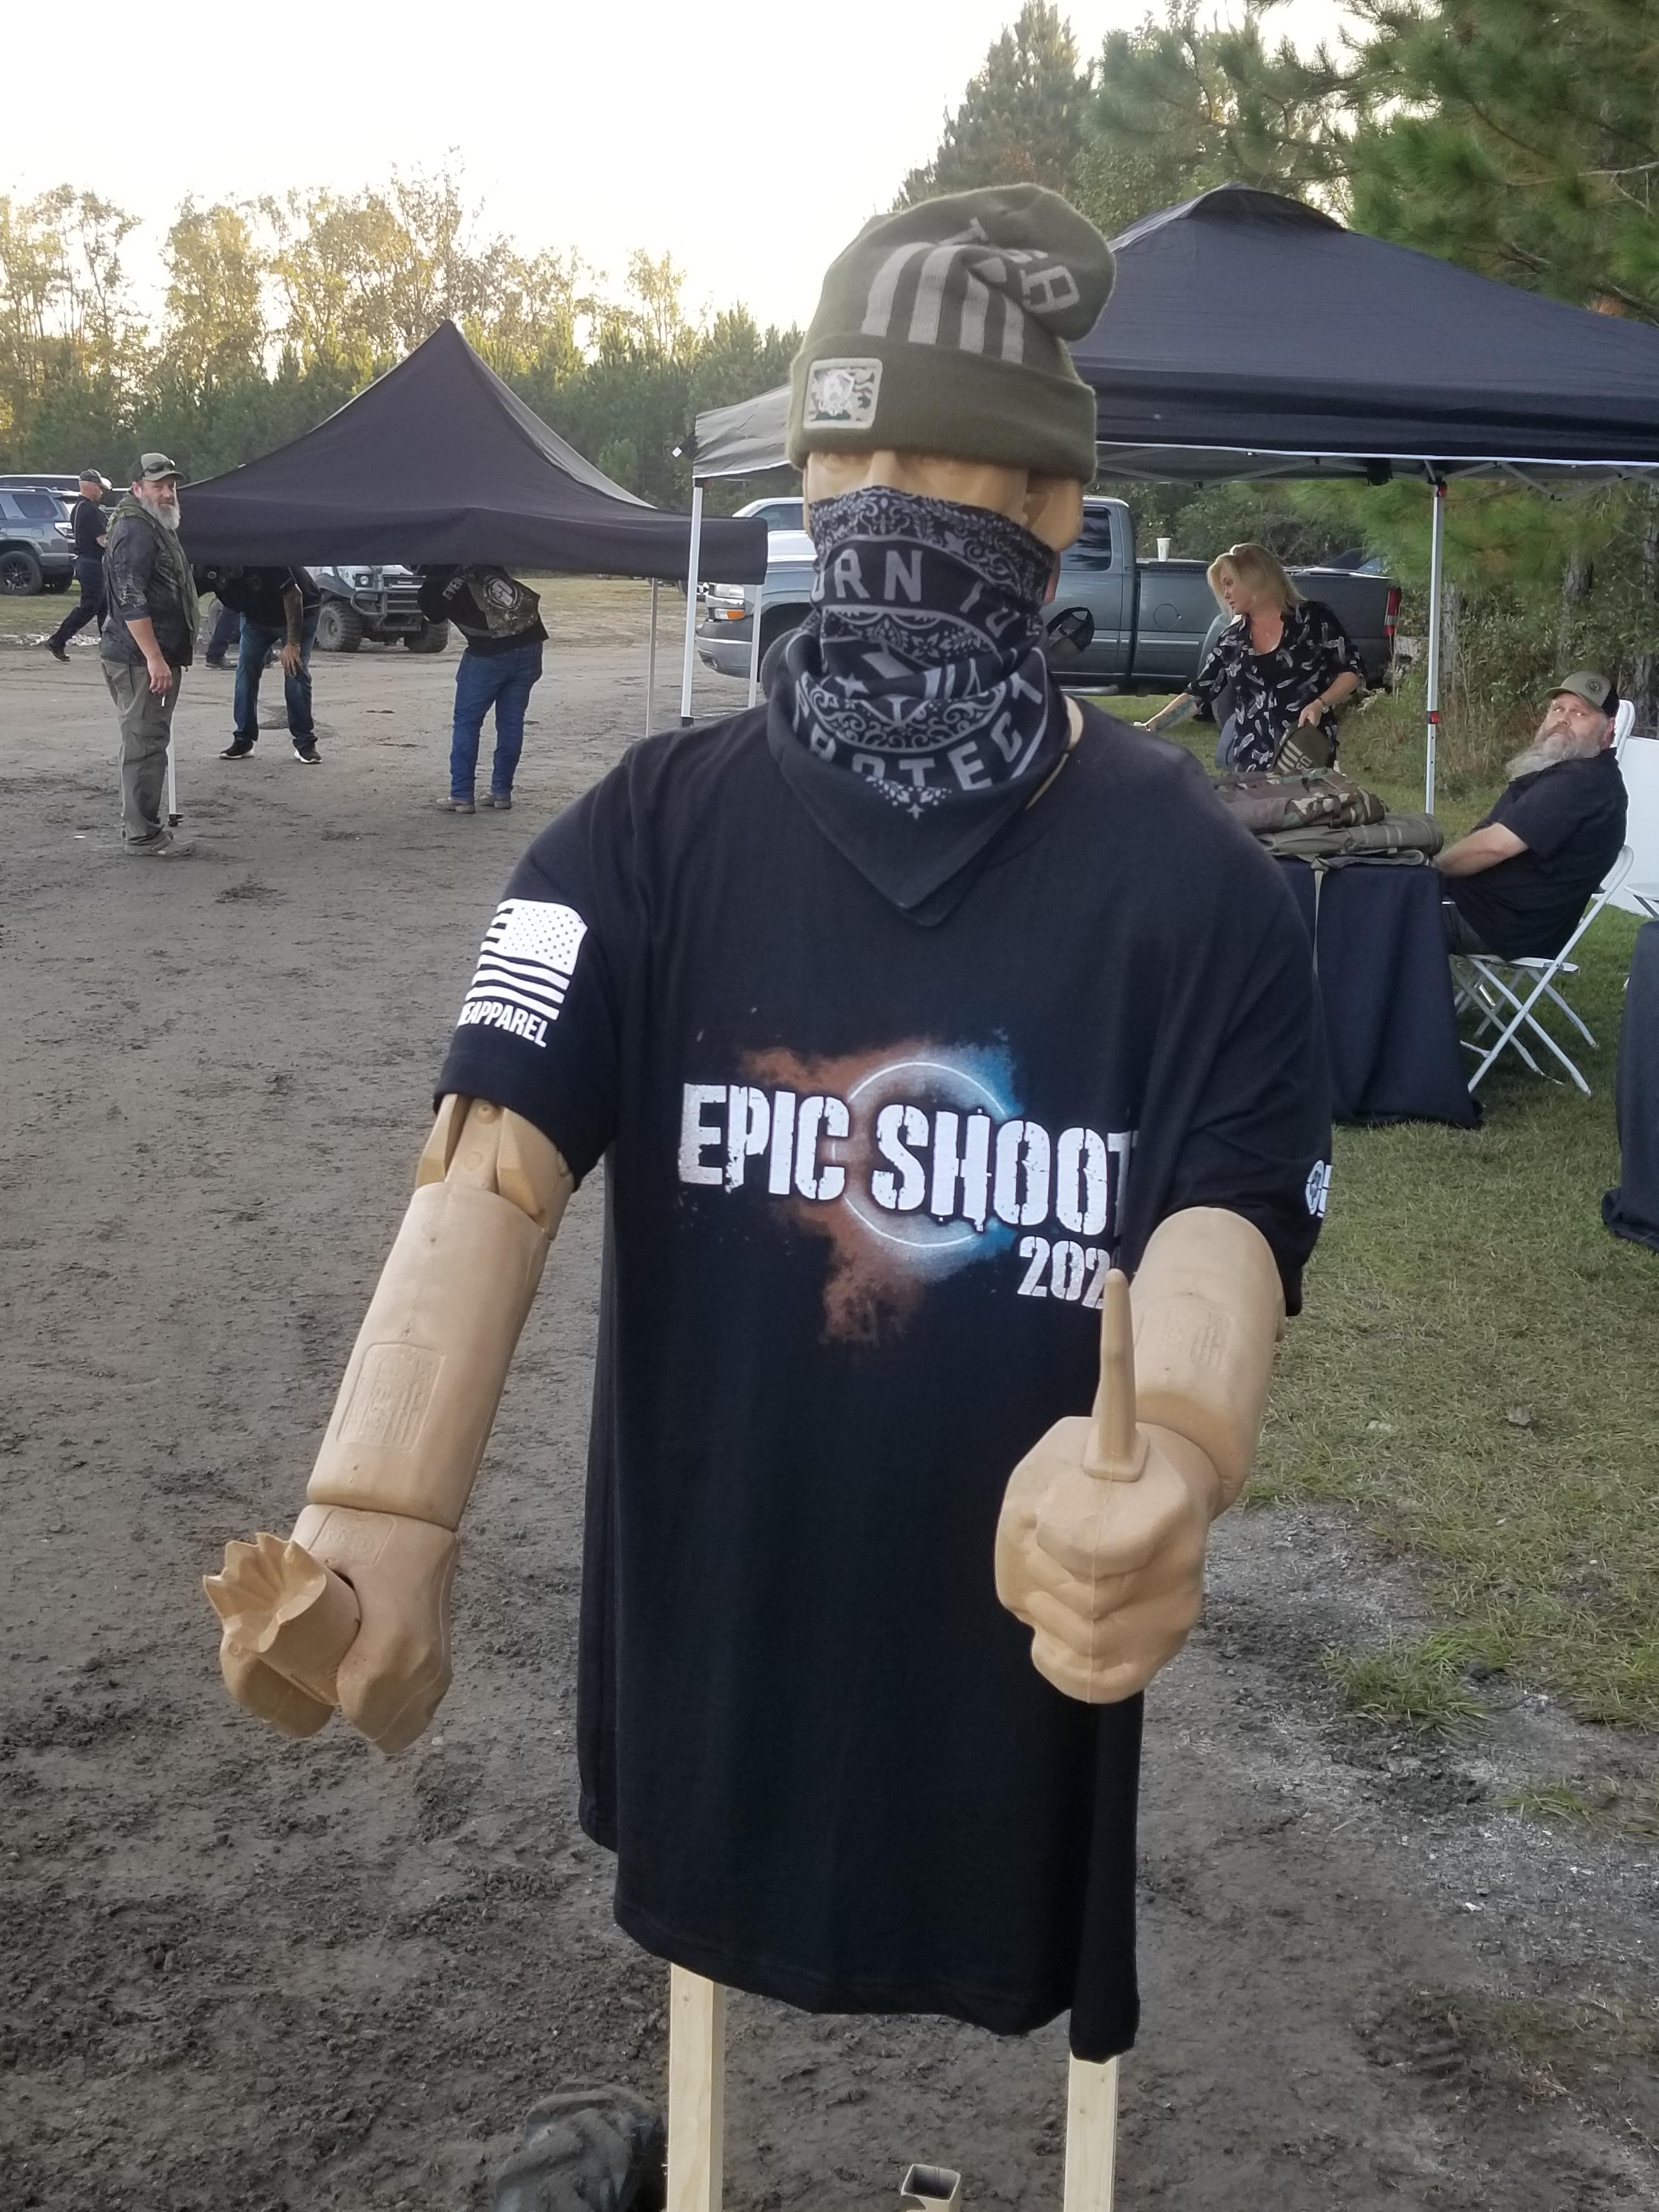 epic-shoot-2020.jpg